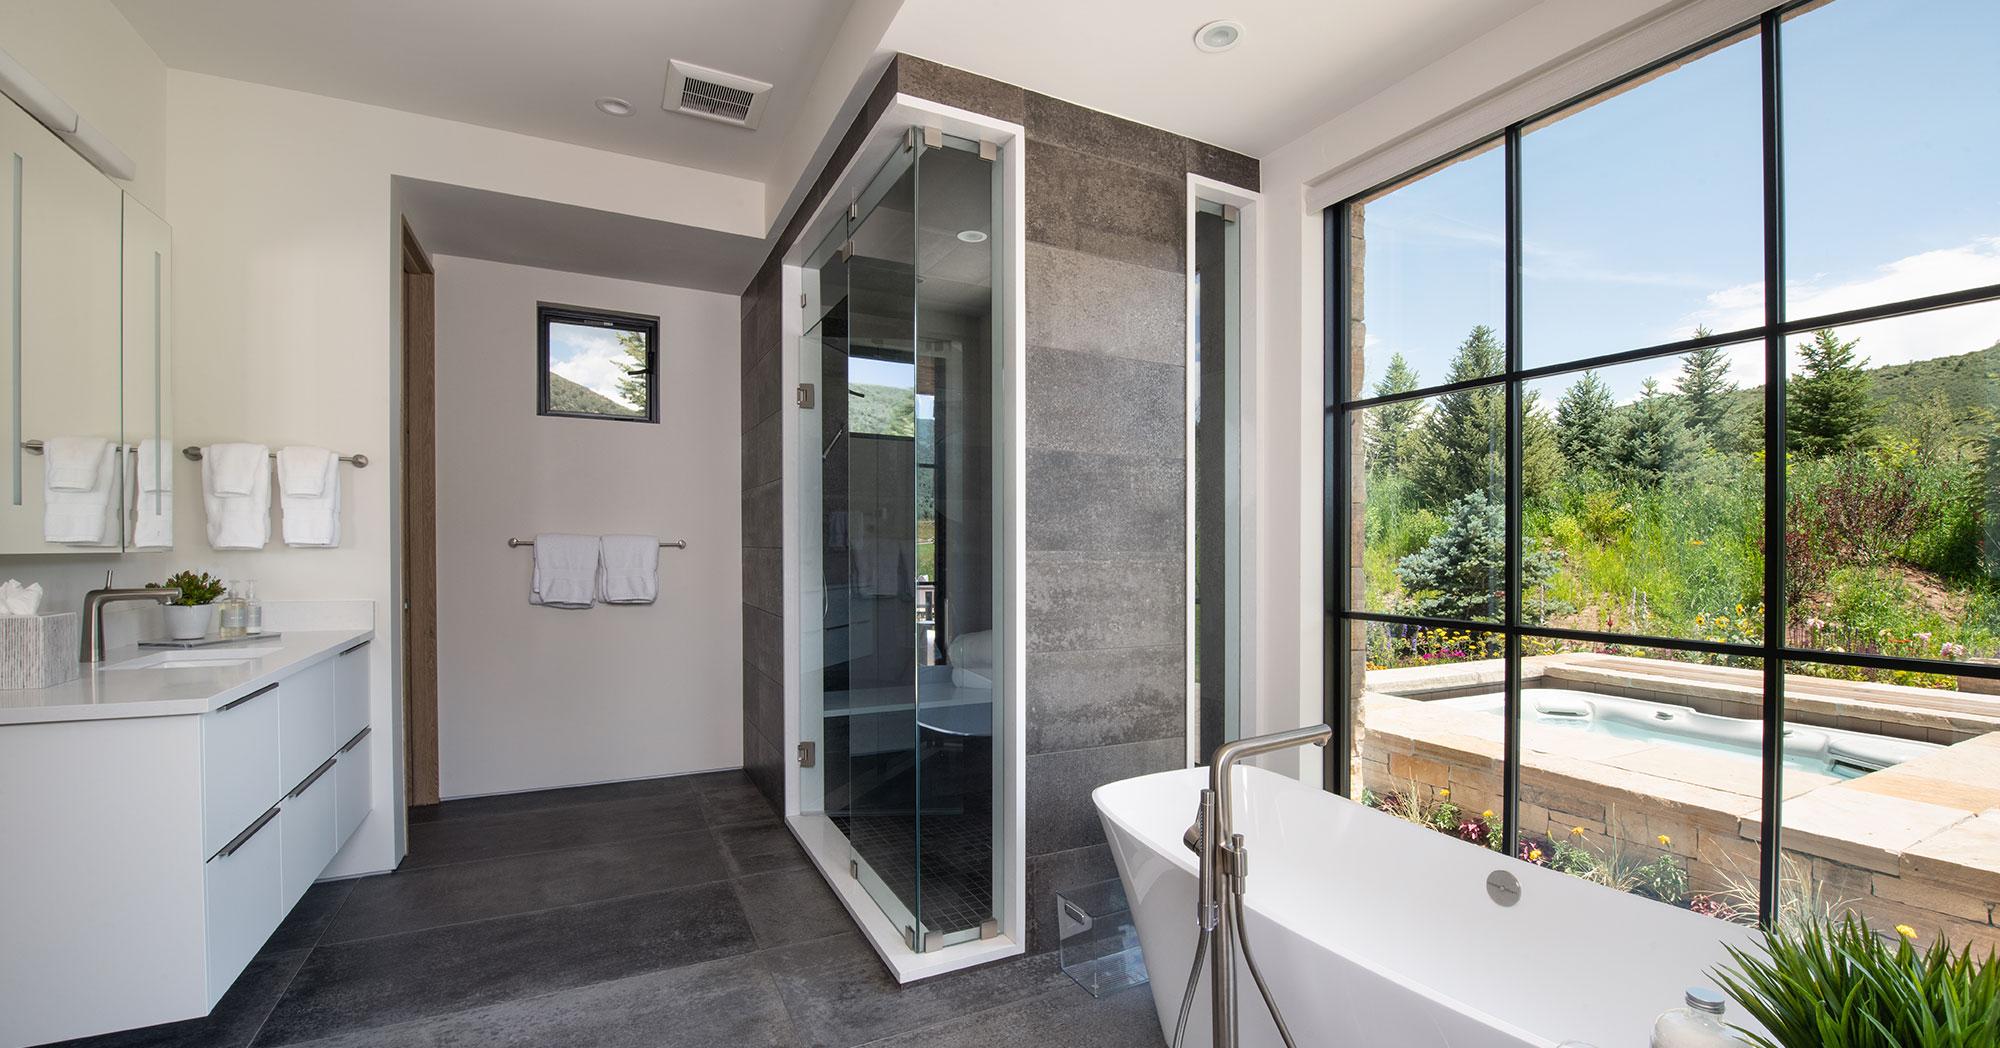 Vail Builders in Arrowhead Bath 2